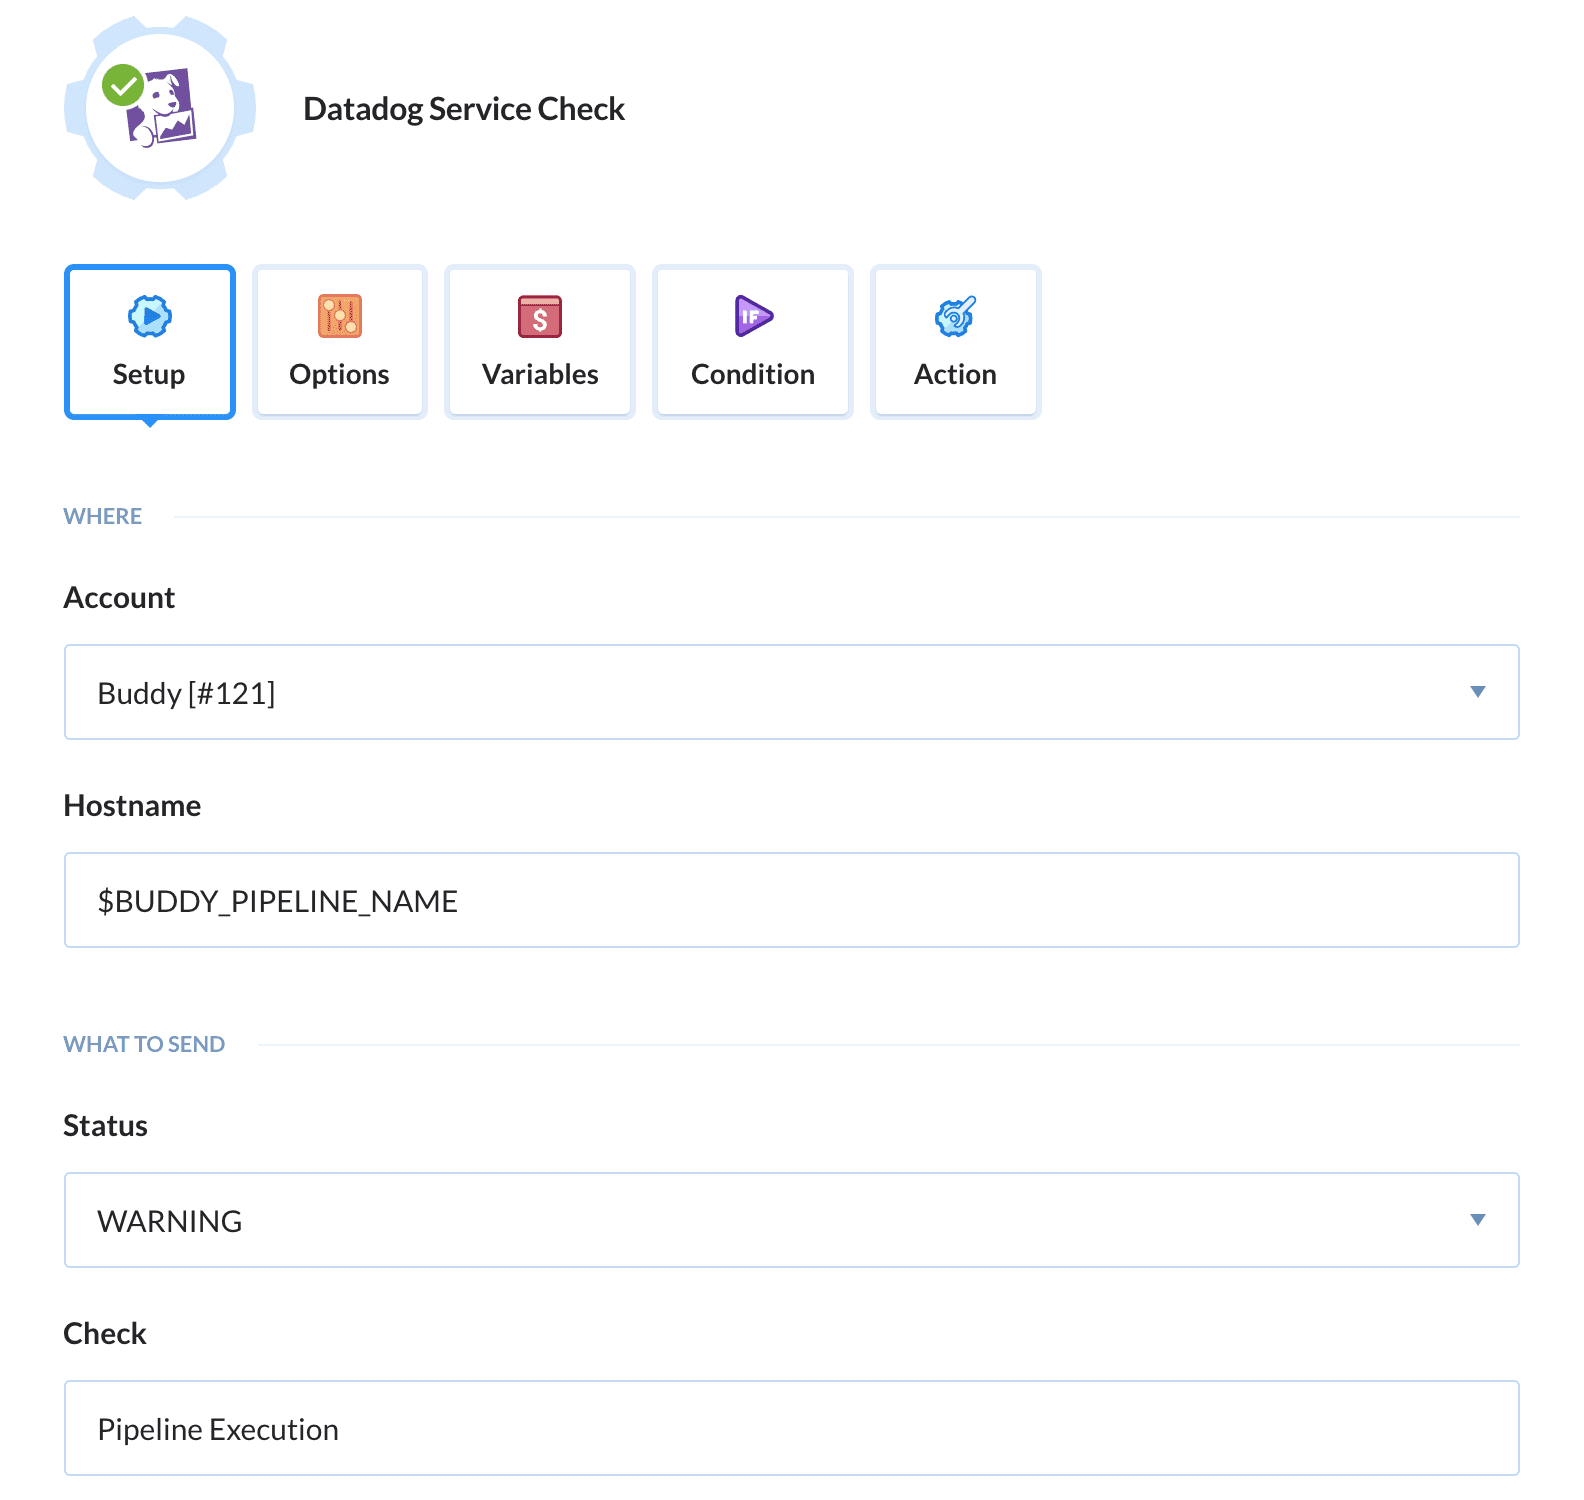 Configuring Datadog action